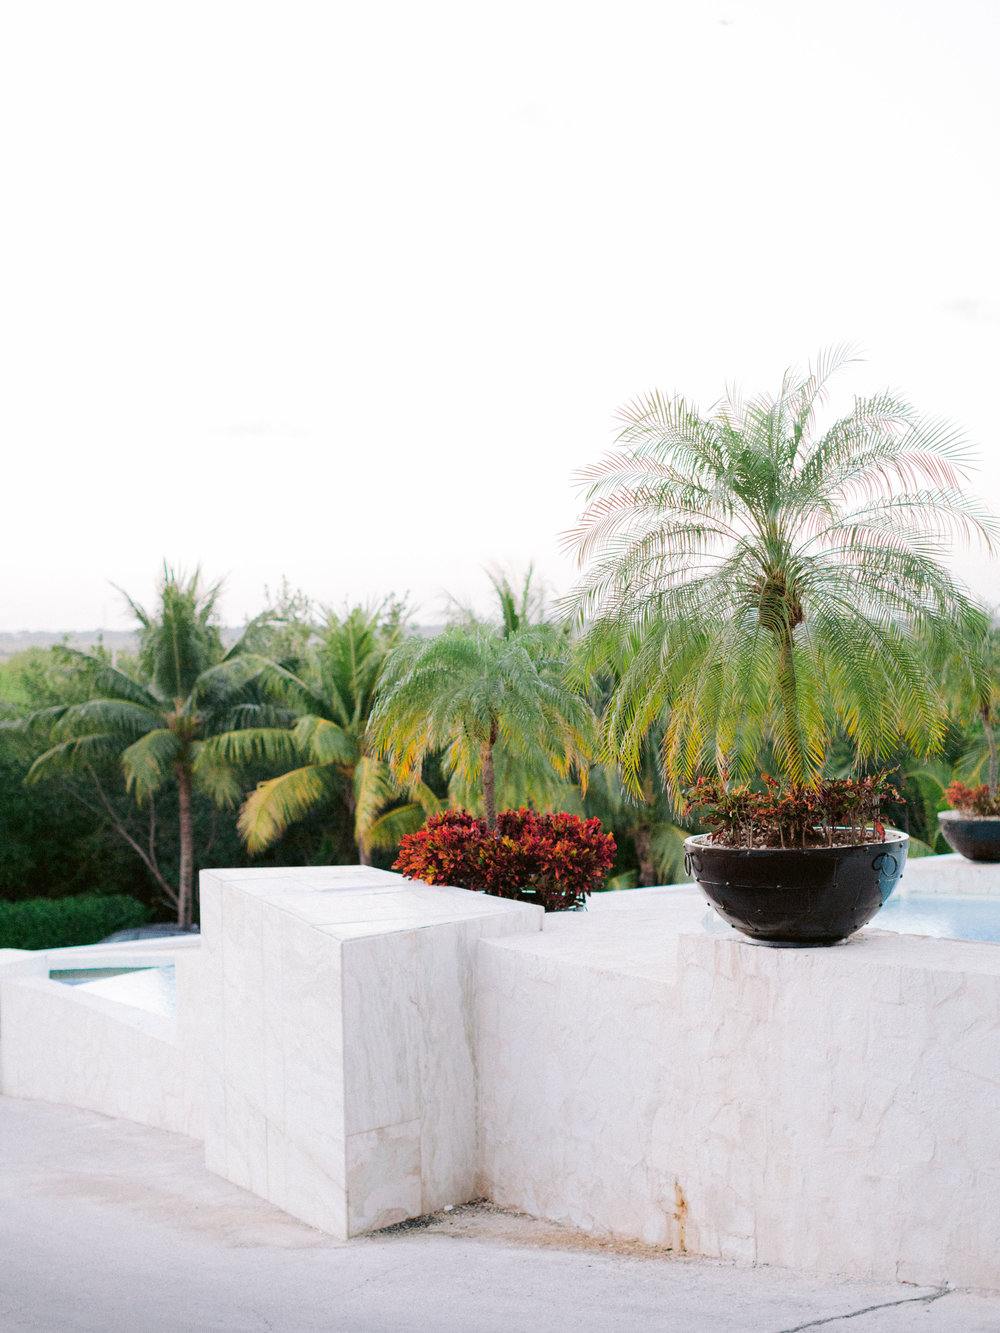 Kim_Jeff_Cancun Wedding_Portraits_Kurtz_Orpia (171 of 178).jpg